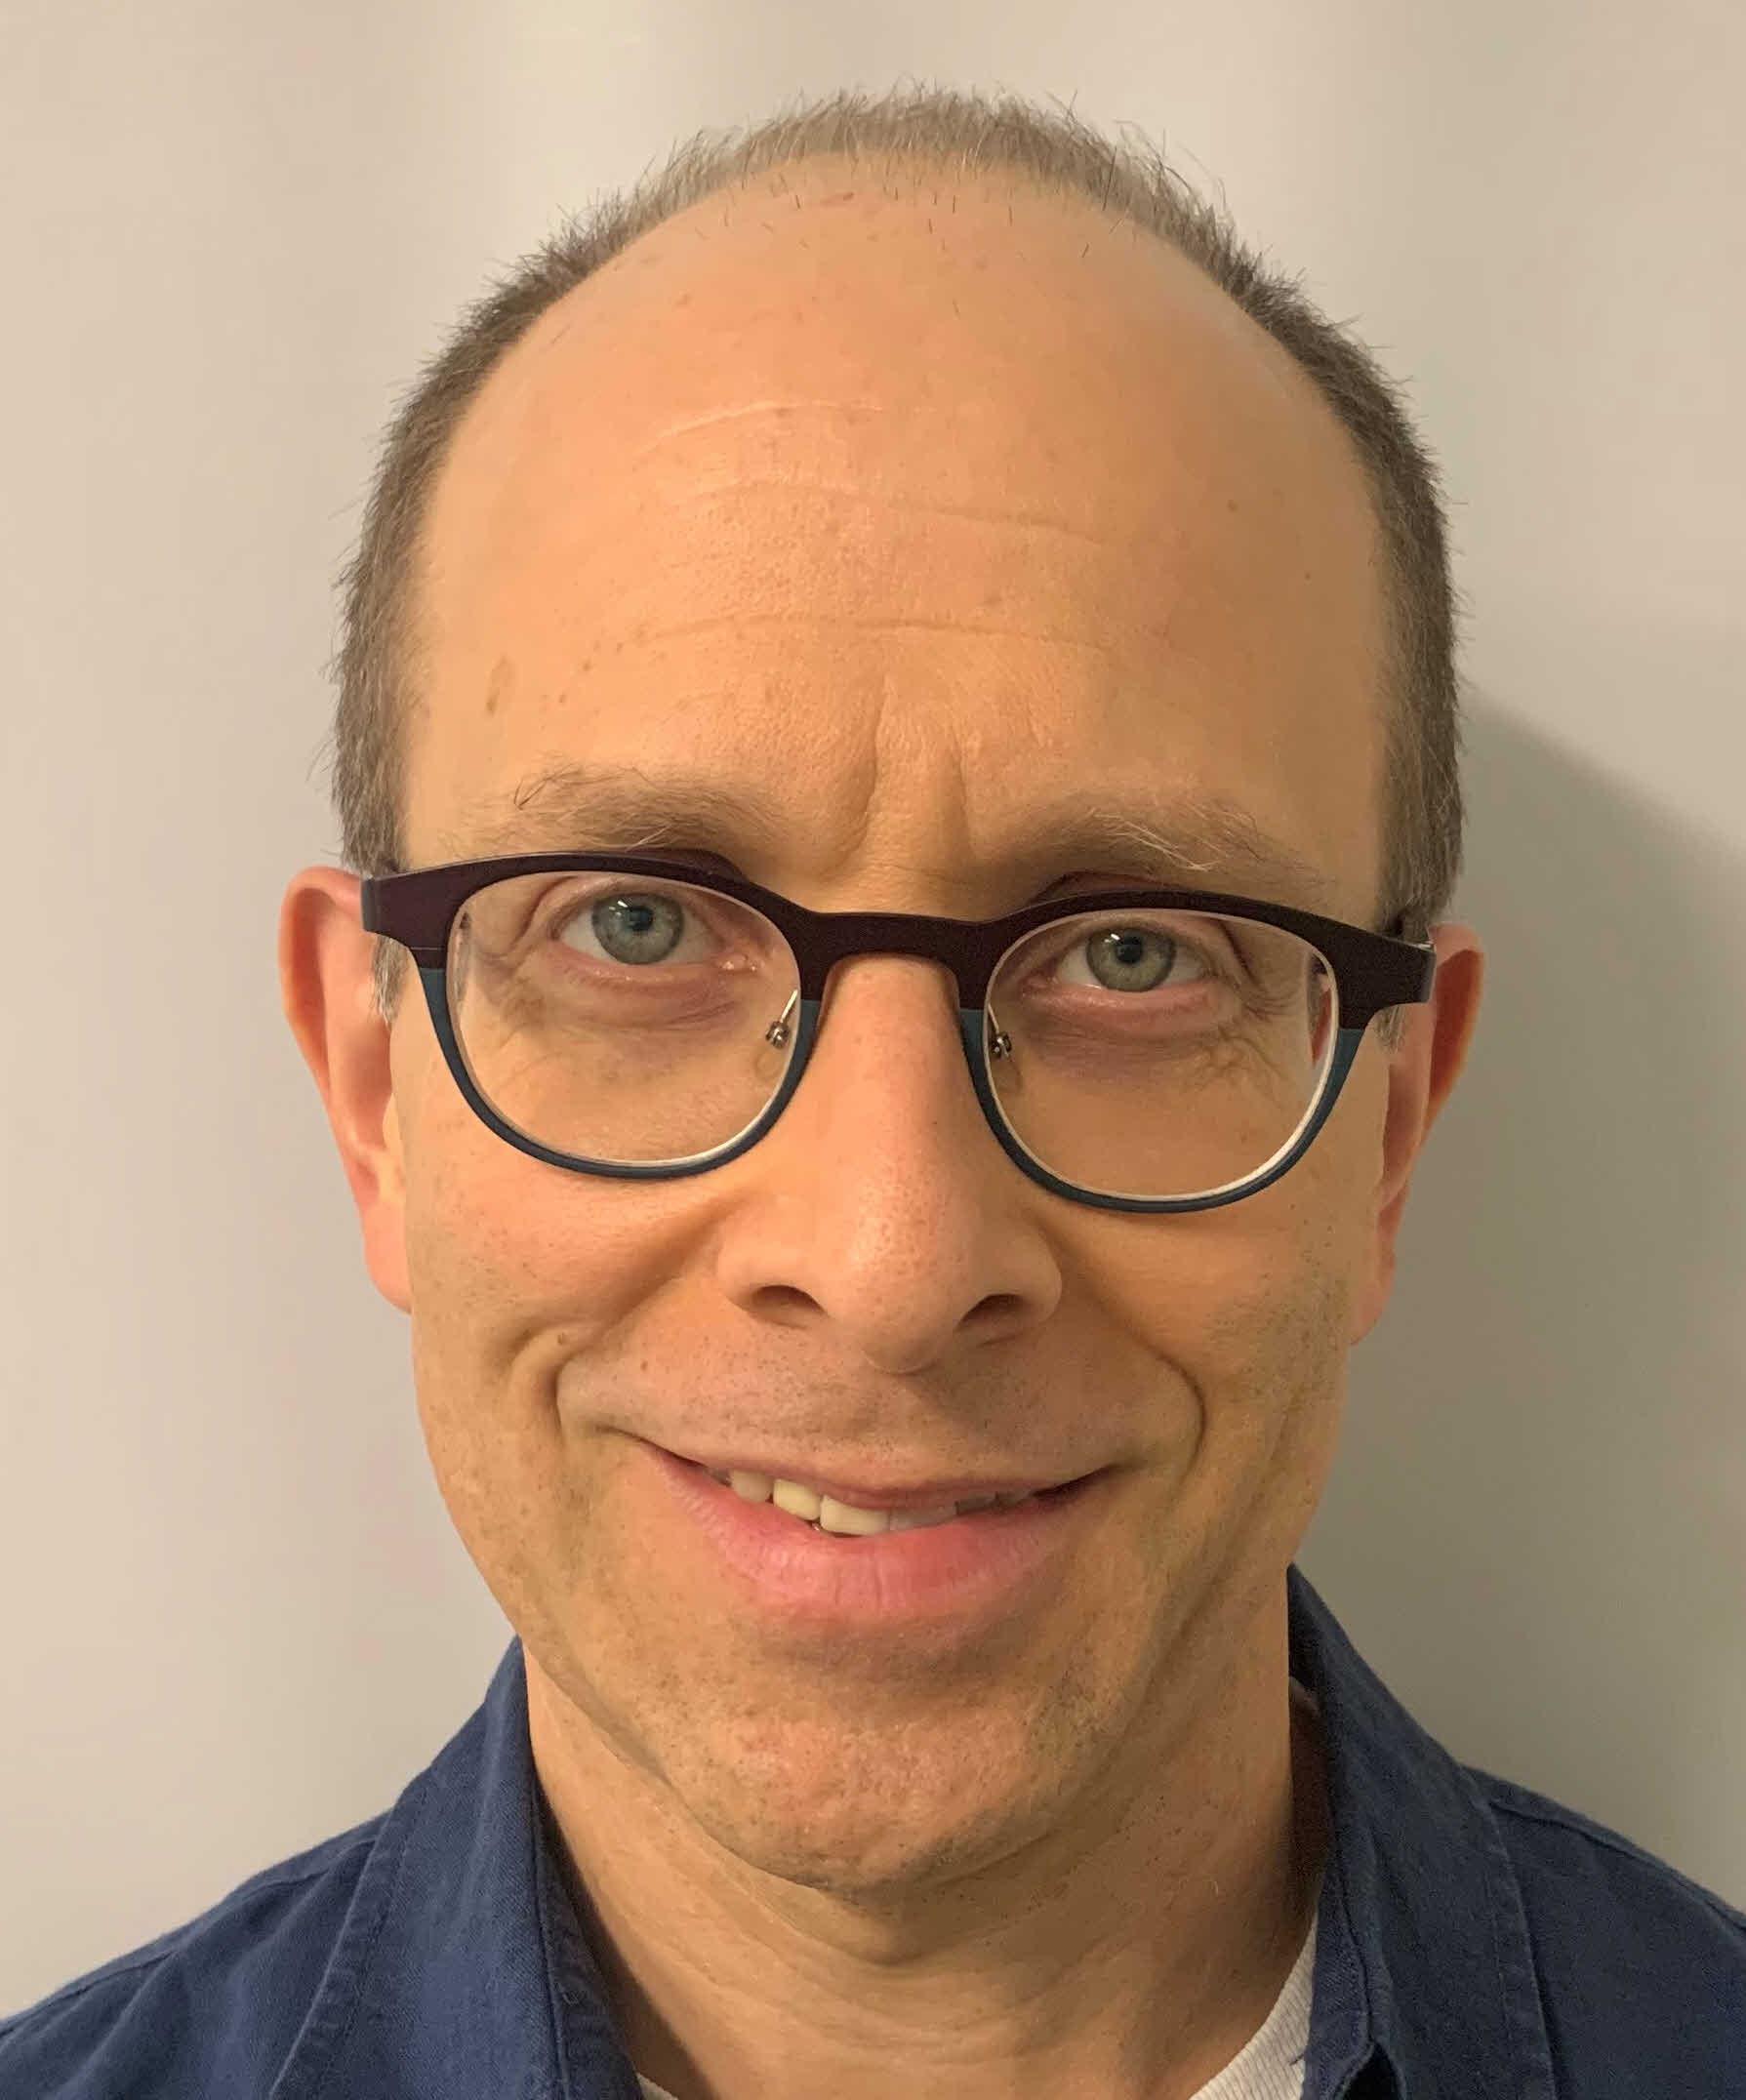 profile image for Craig Bida